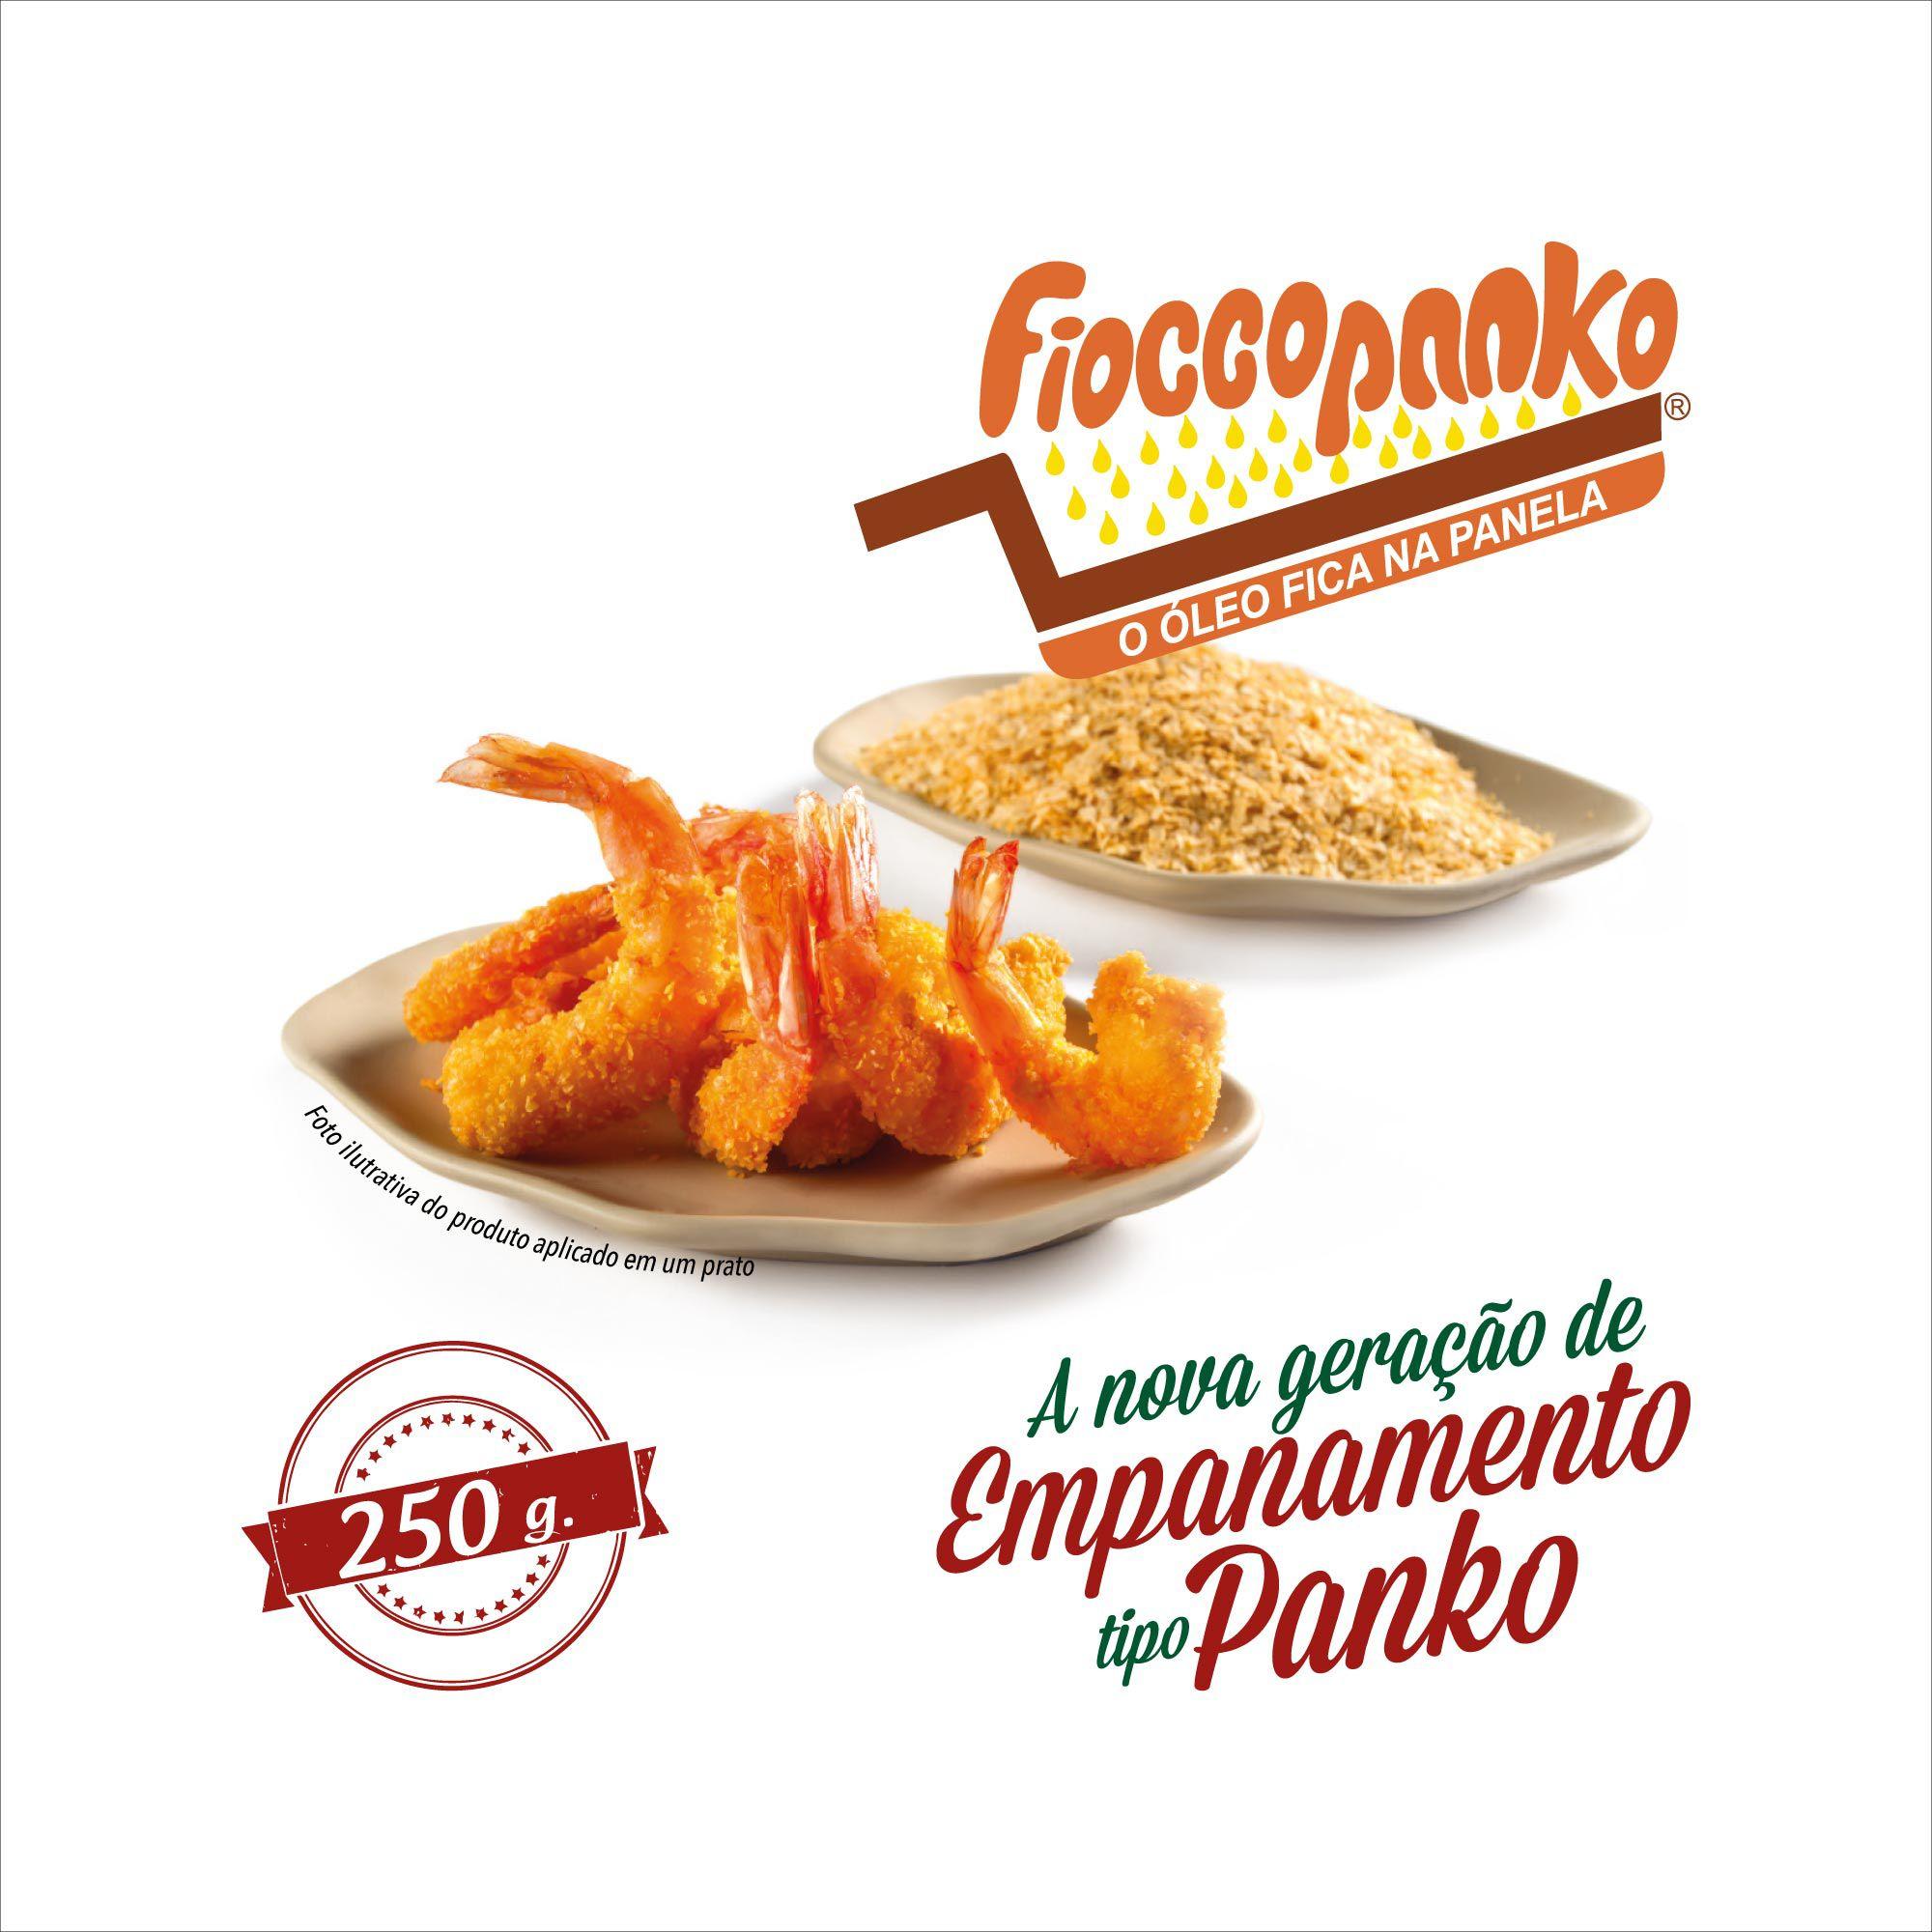 Fioccopanko 250g